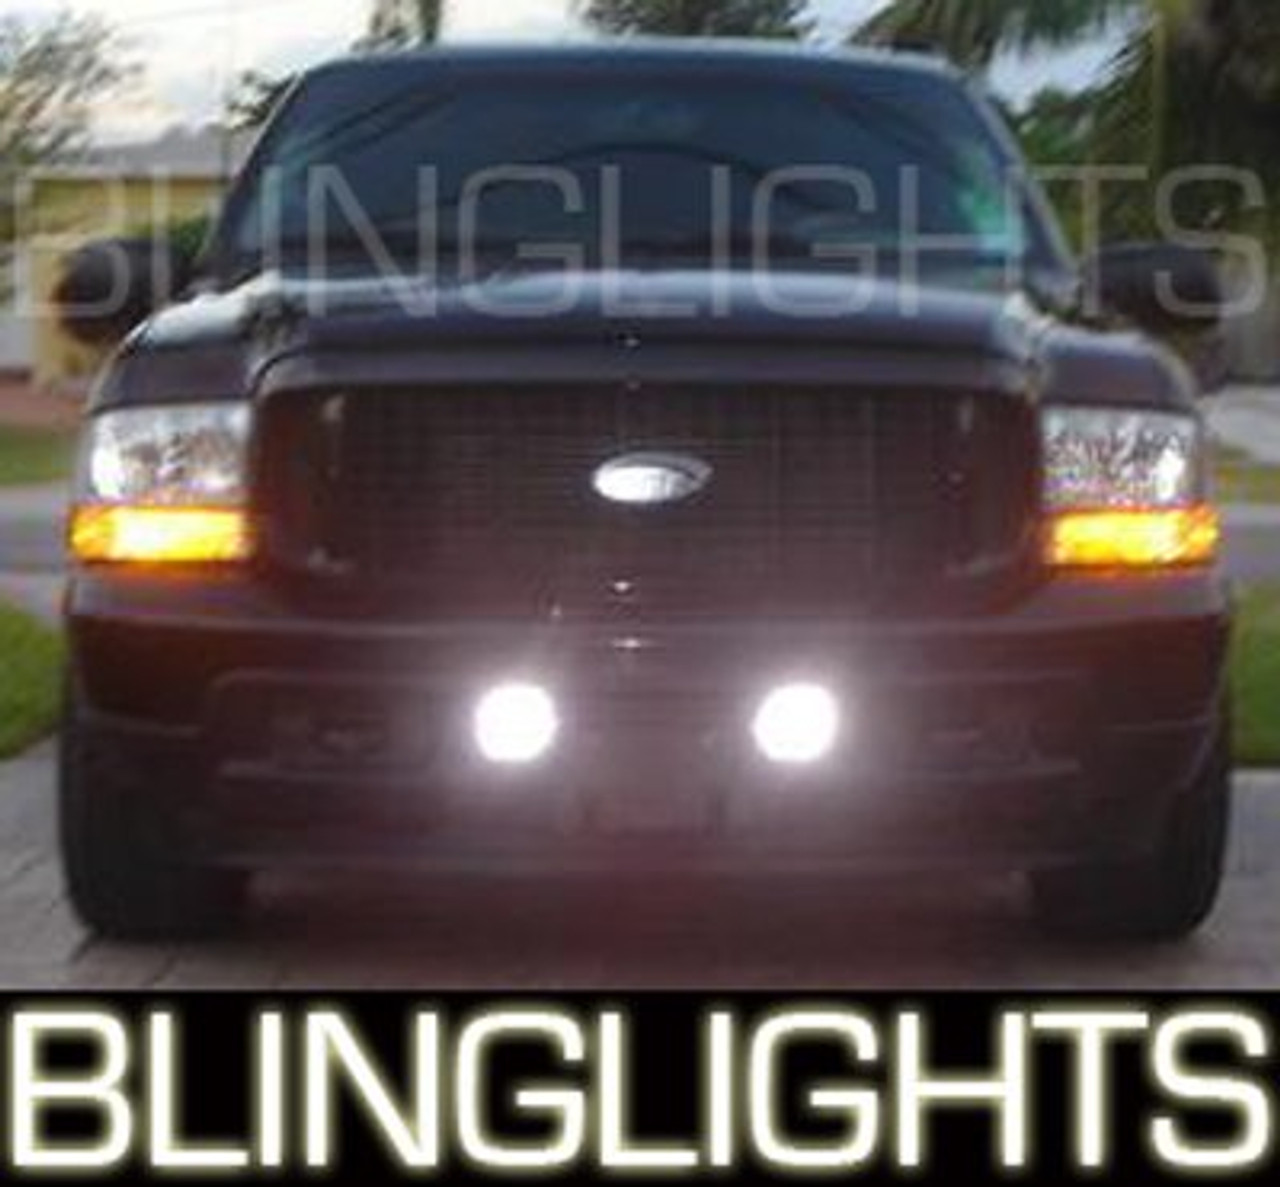 1999 2000 2001 2002 2003 2004 2005 2006 2007 Ford SuperDuty Xenon Foglamps Fog Lamps Lights Kit